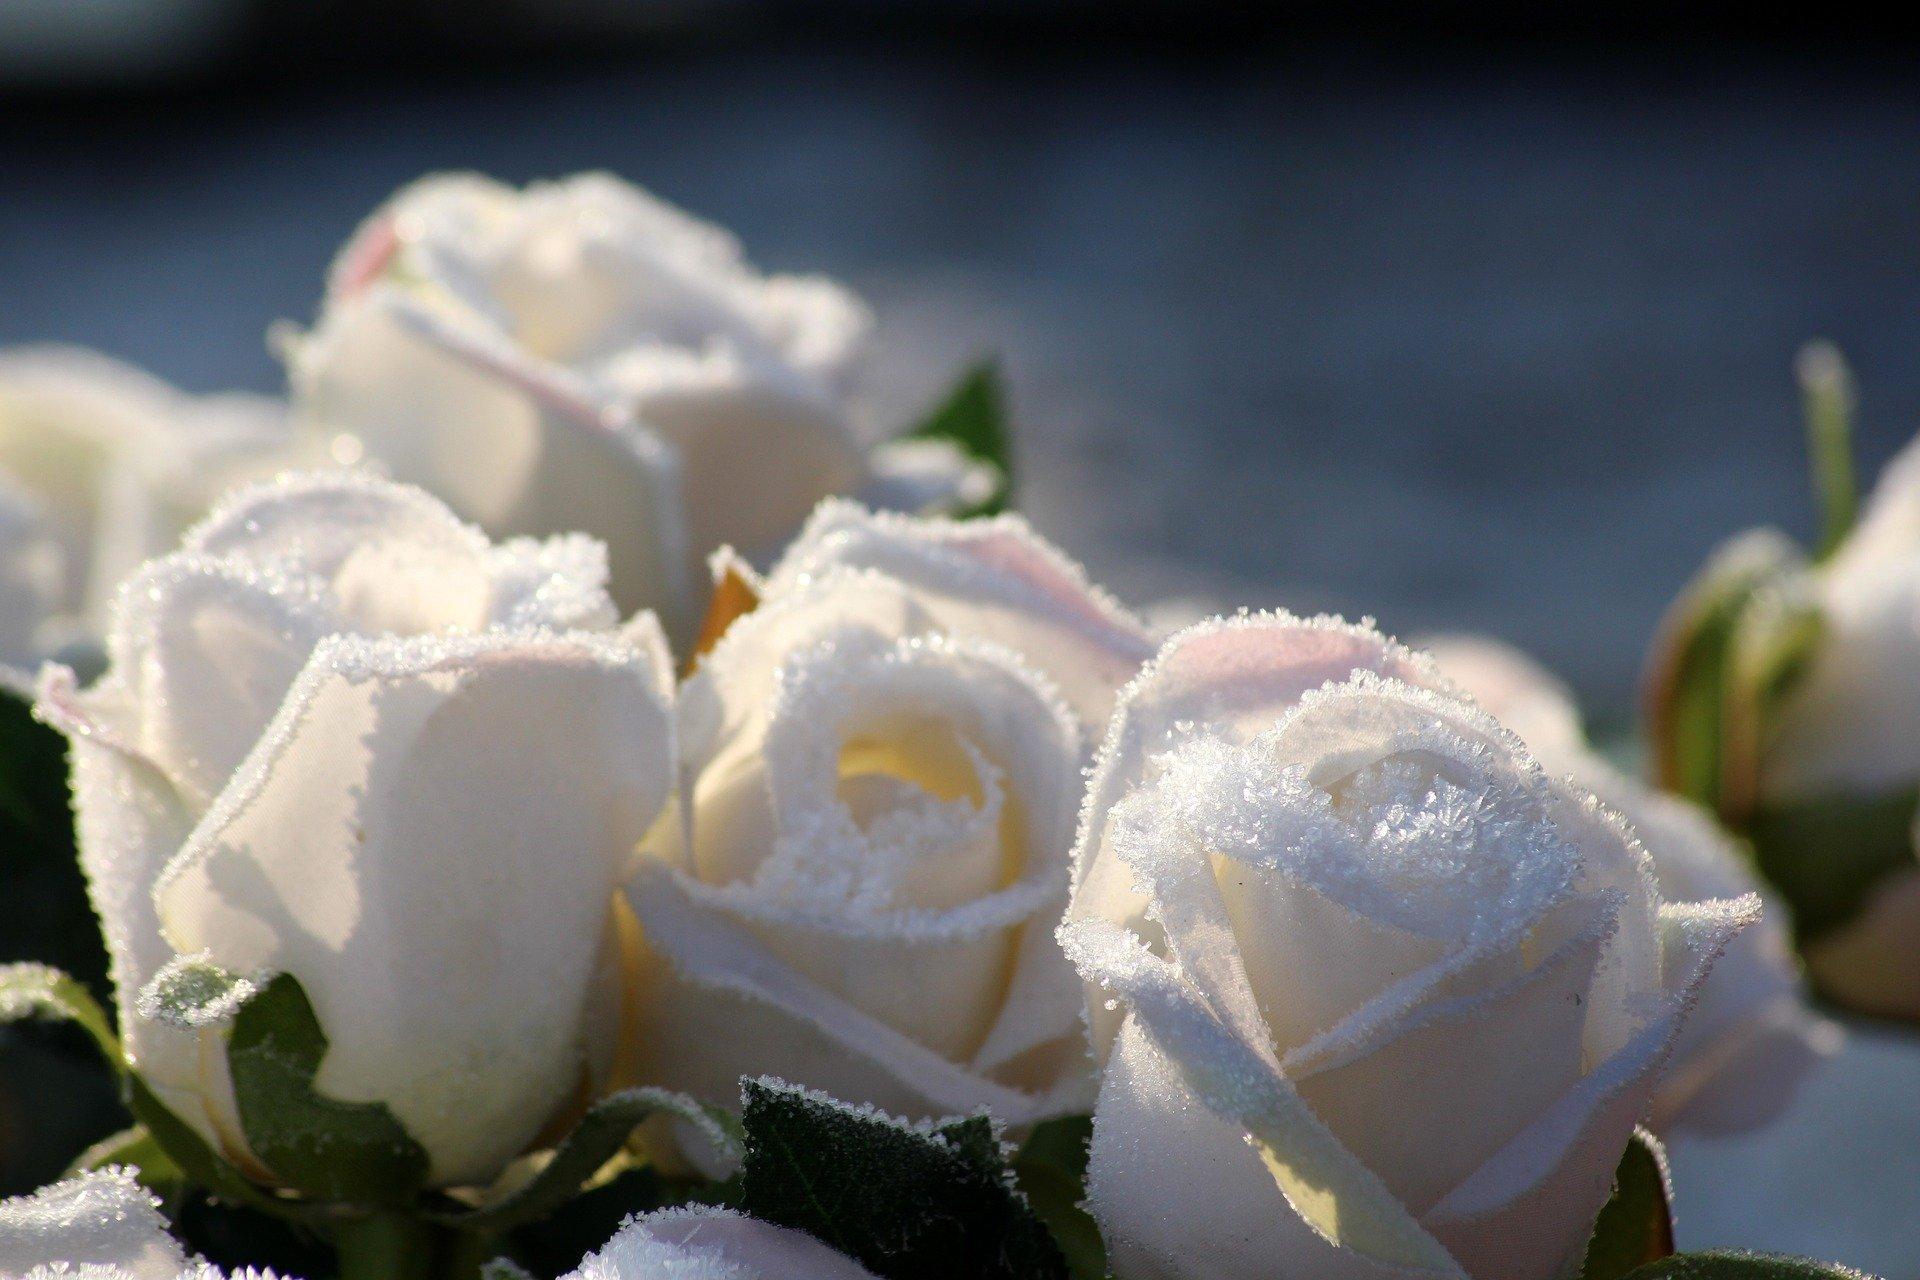 Roses blanches givrées